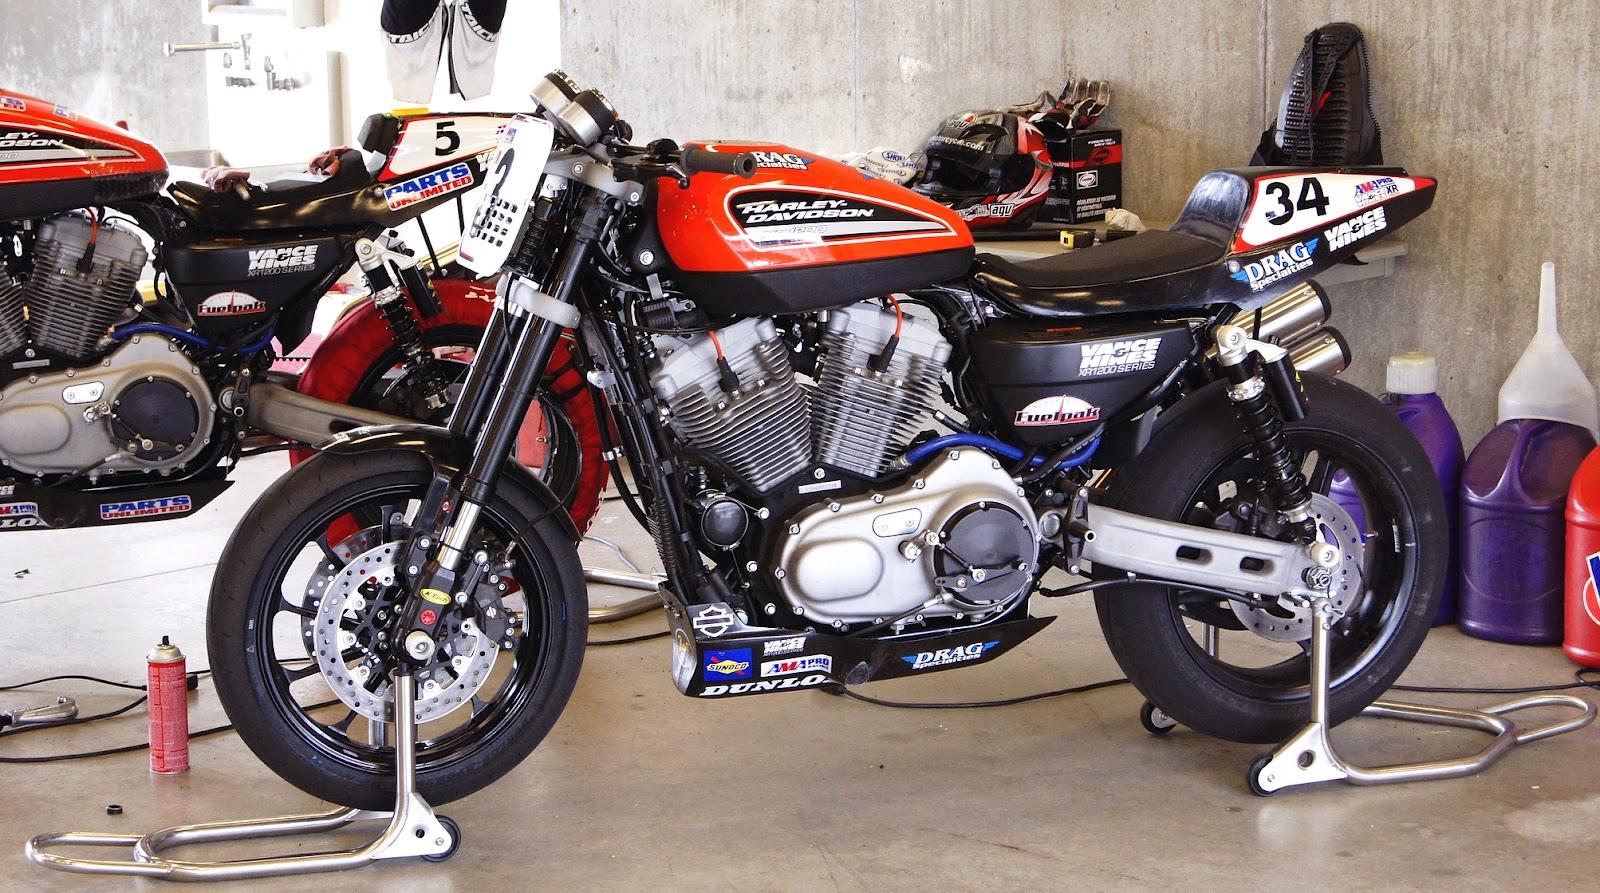 Stu's Shots R Us: AMA Road Racing: Harley-Davidson and Vance & Hines